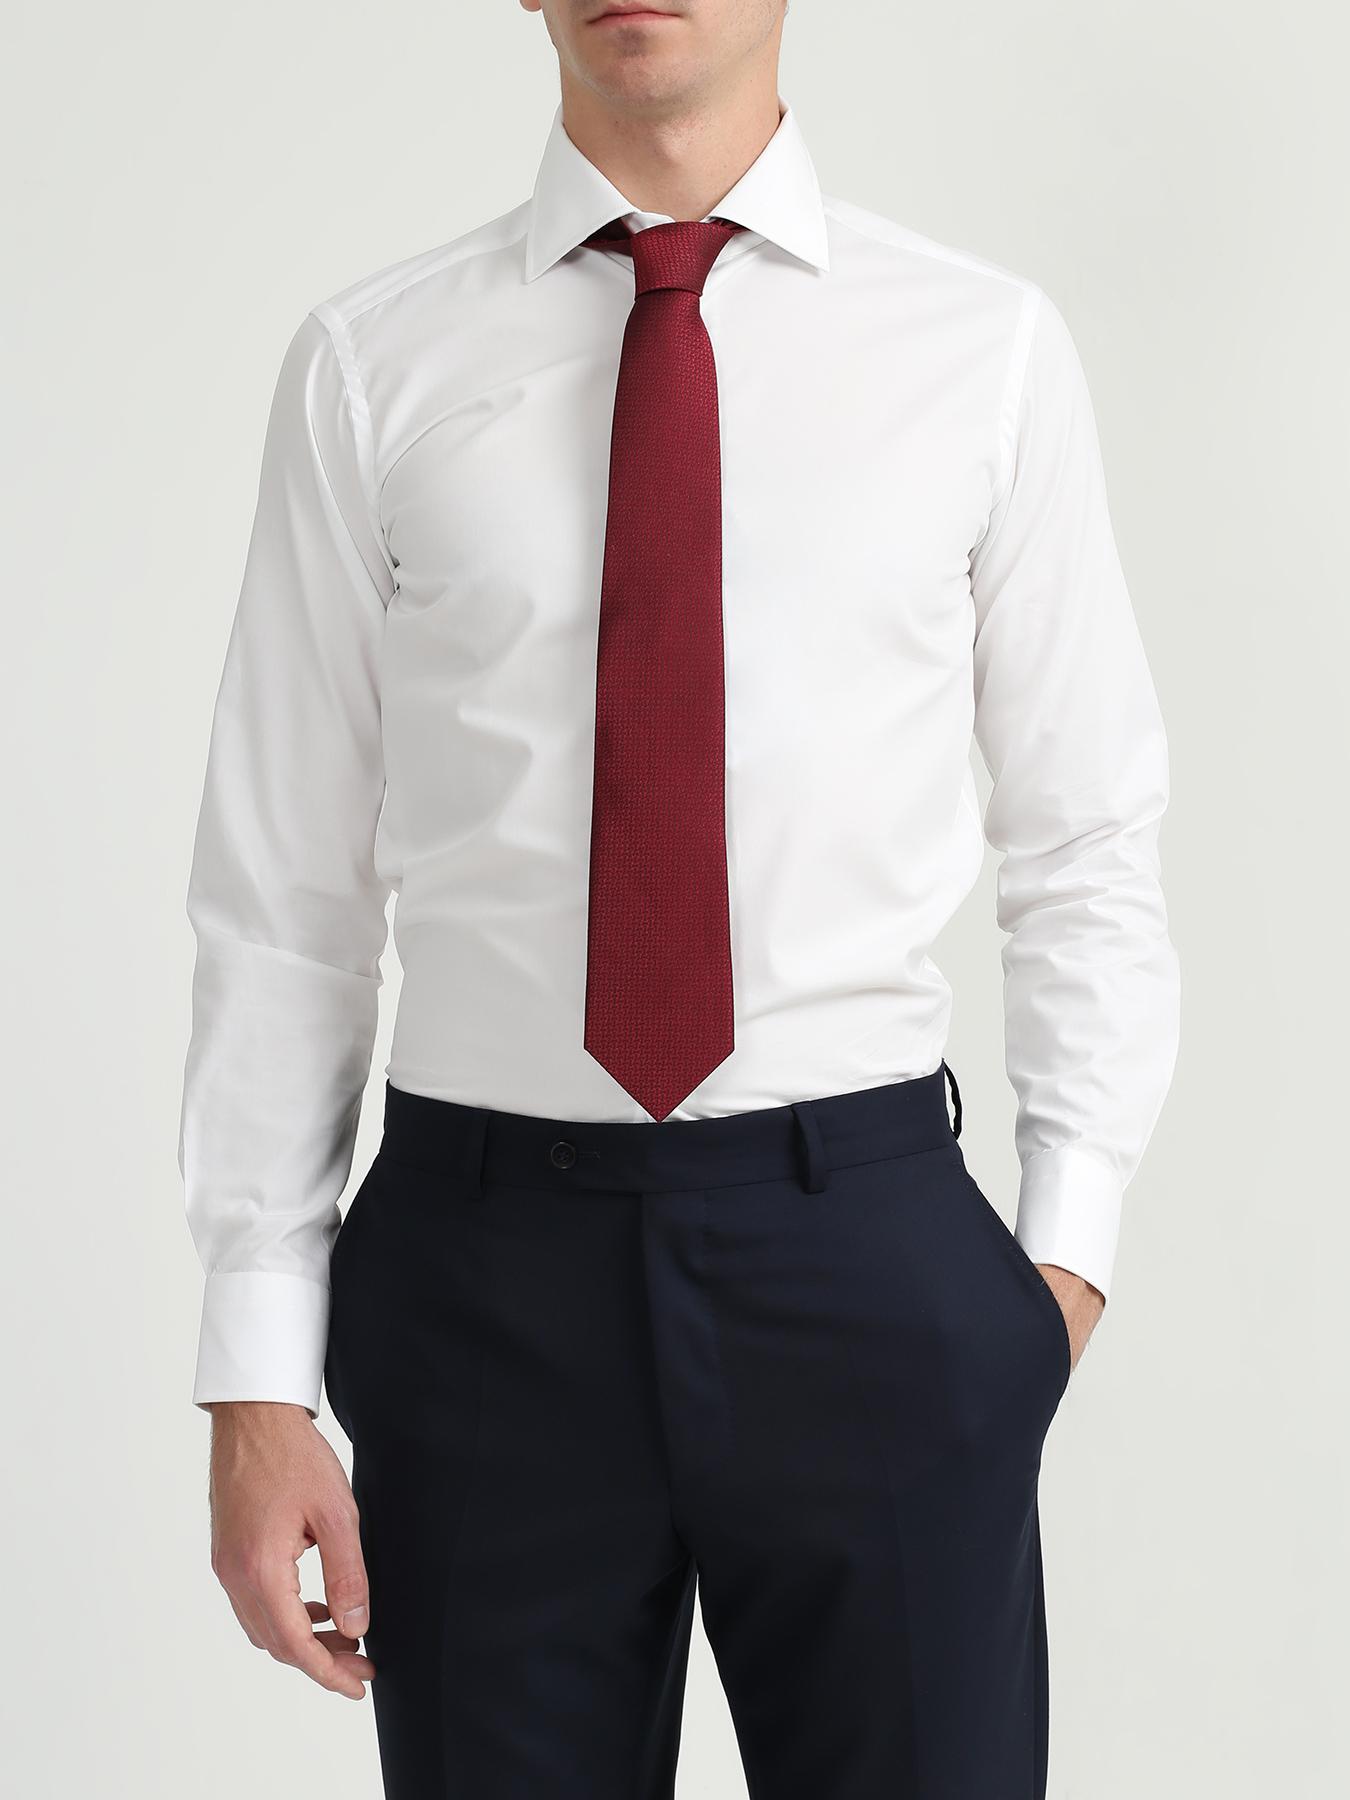 Alessandro Manzoni Шелковый галстук с узорами 324195-185